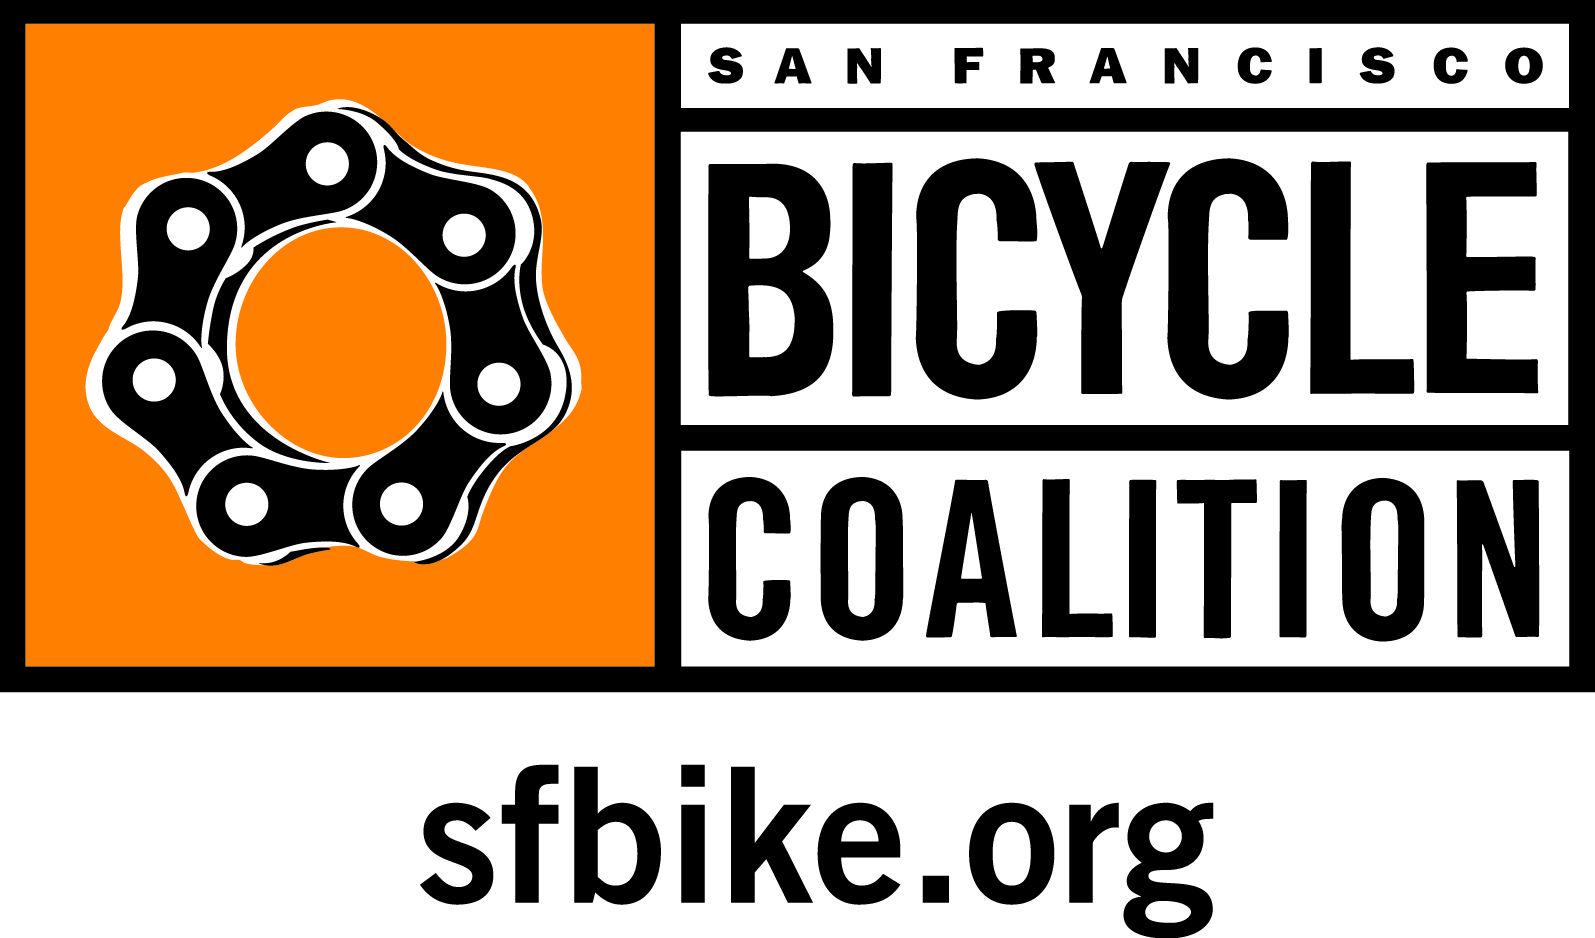 SF Bicycle Coalition LOGO | CykloDESIGN | Pinterest | Logos